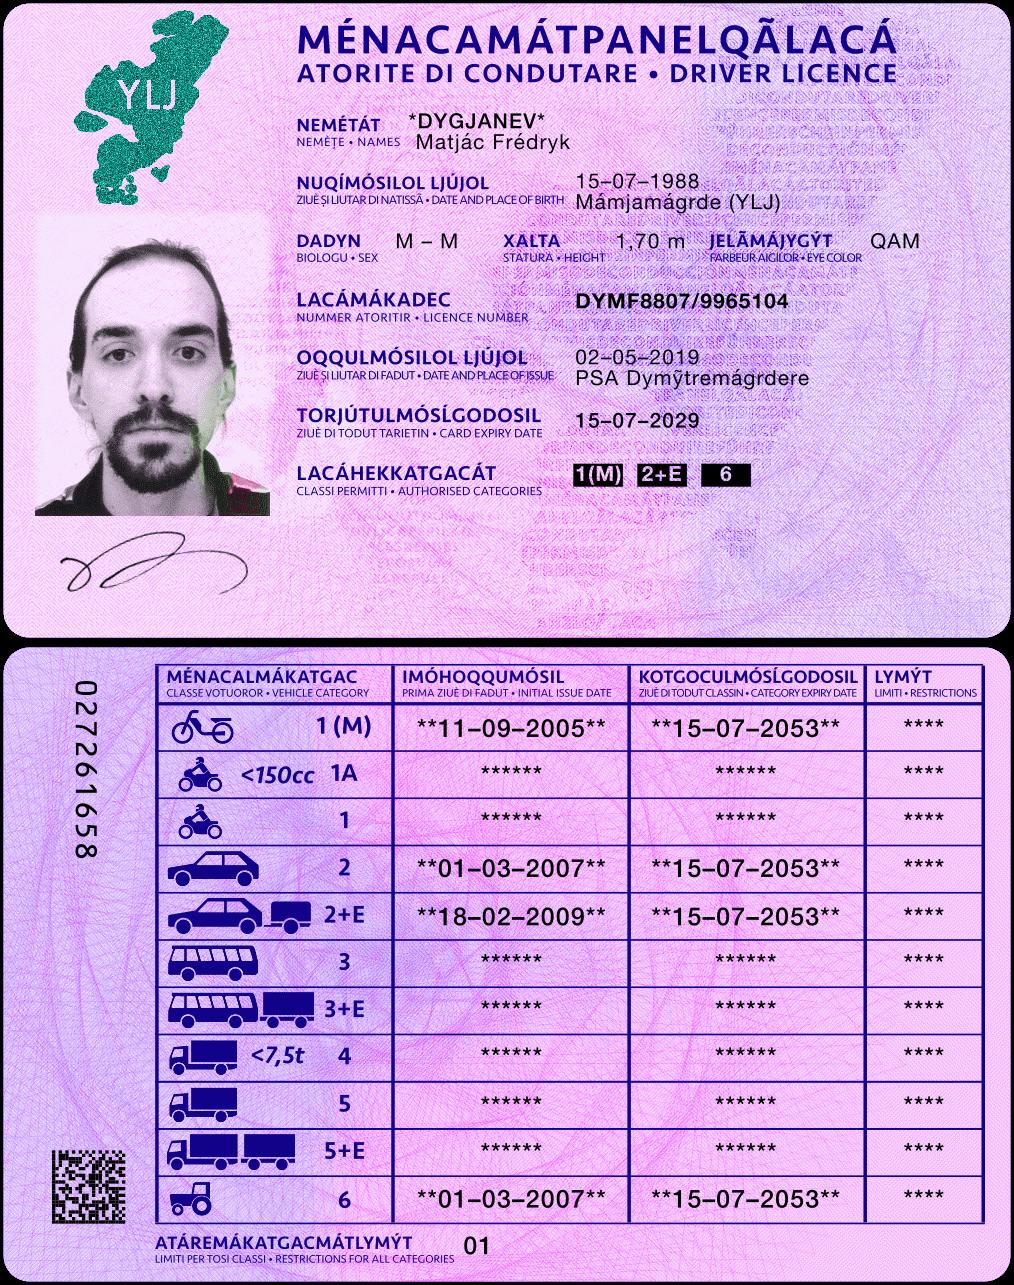 ddft7a7-461d640e-69bc-4e80-8187-8c138a45